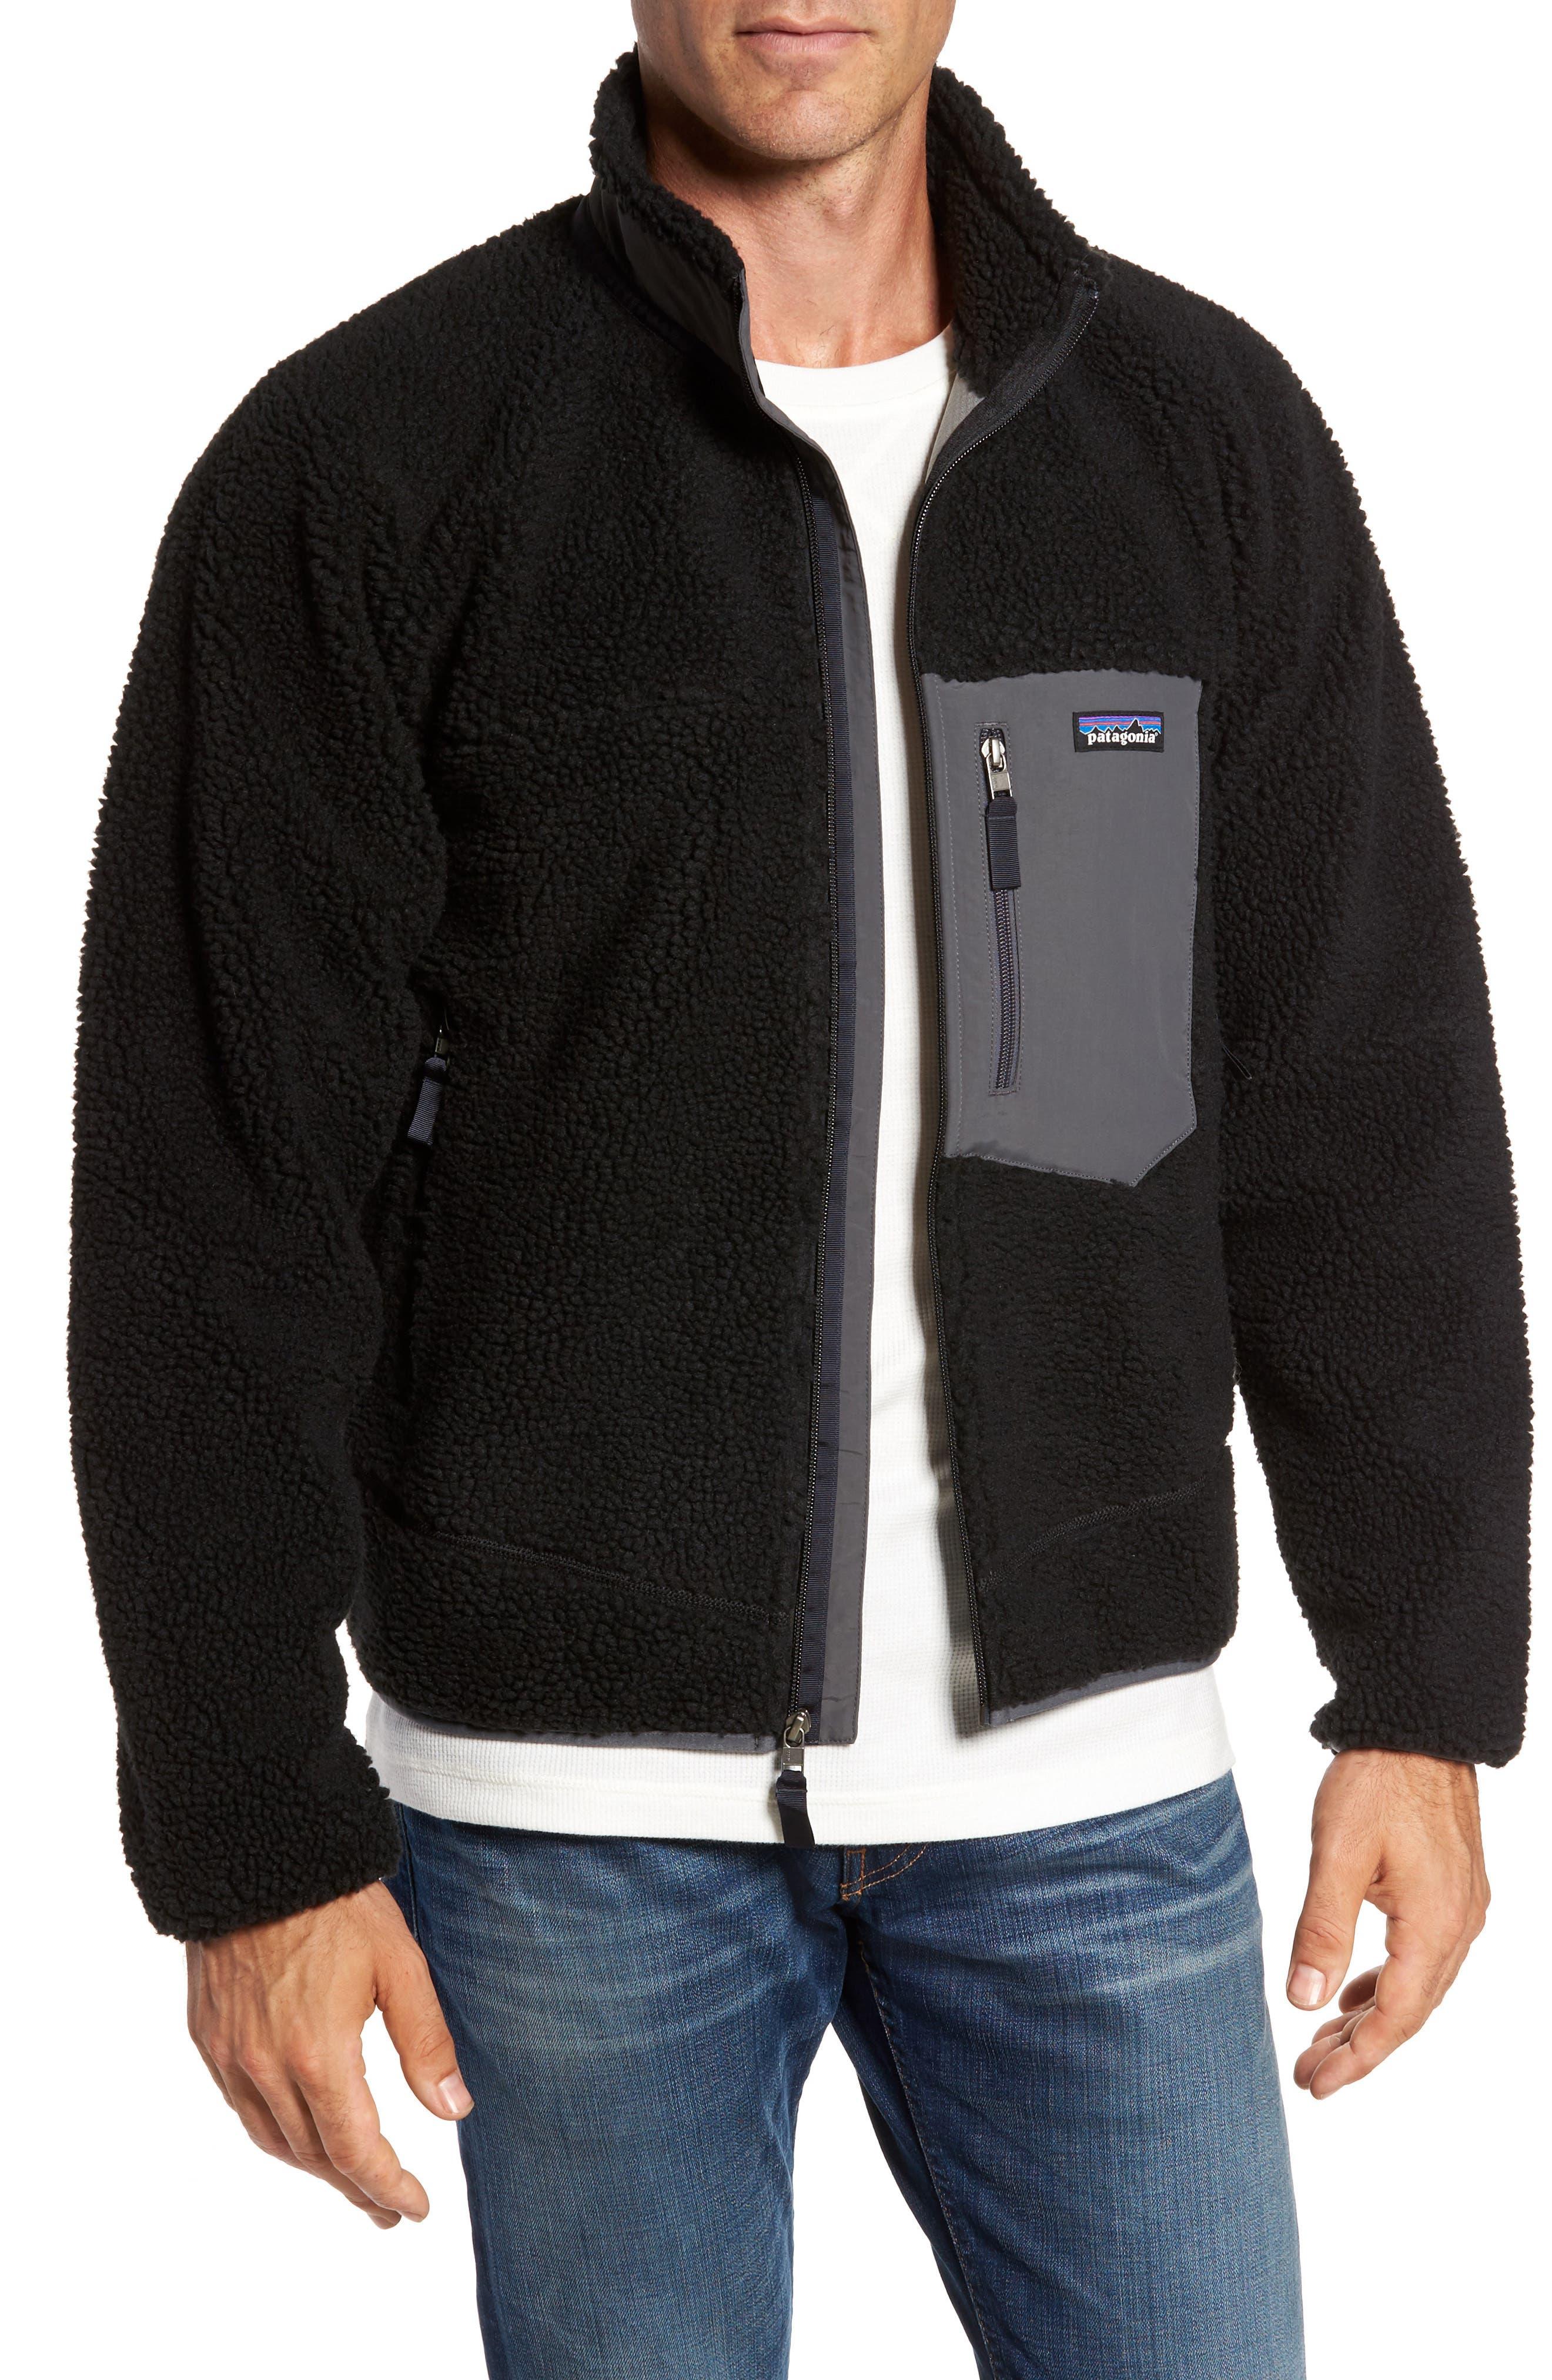 Retro-X Fleece Jacket,                             Main thumbnail 1, color,                             002